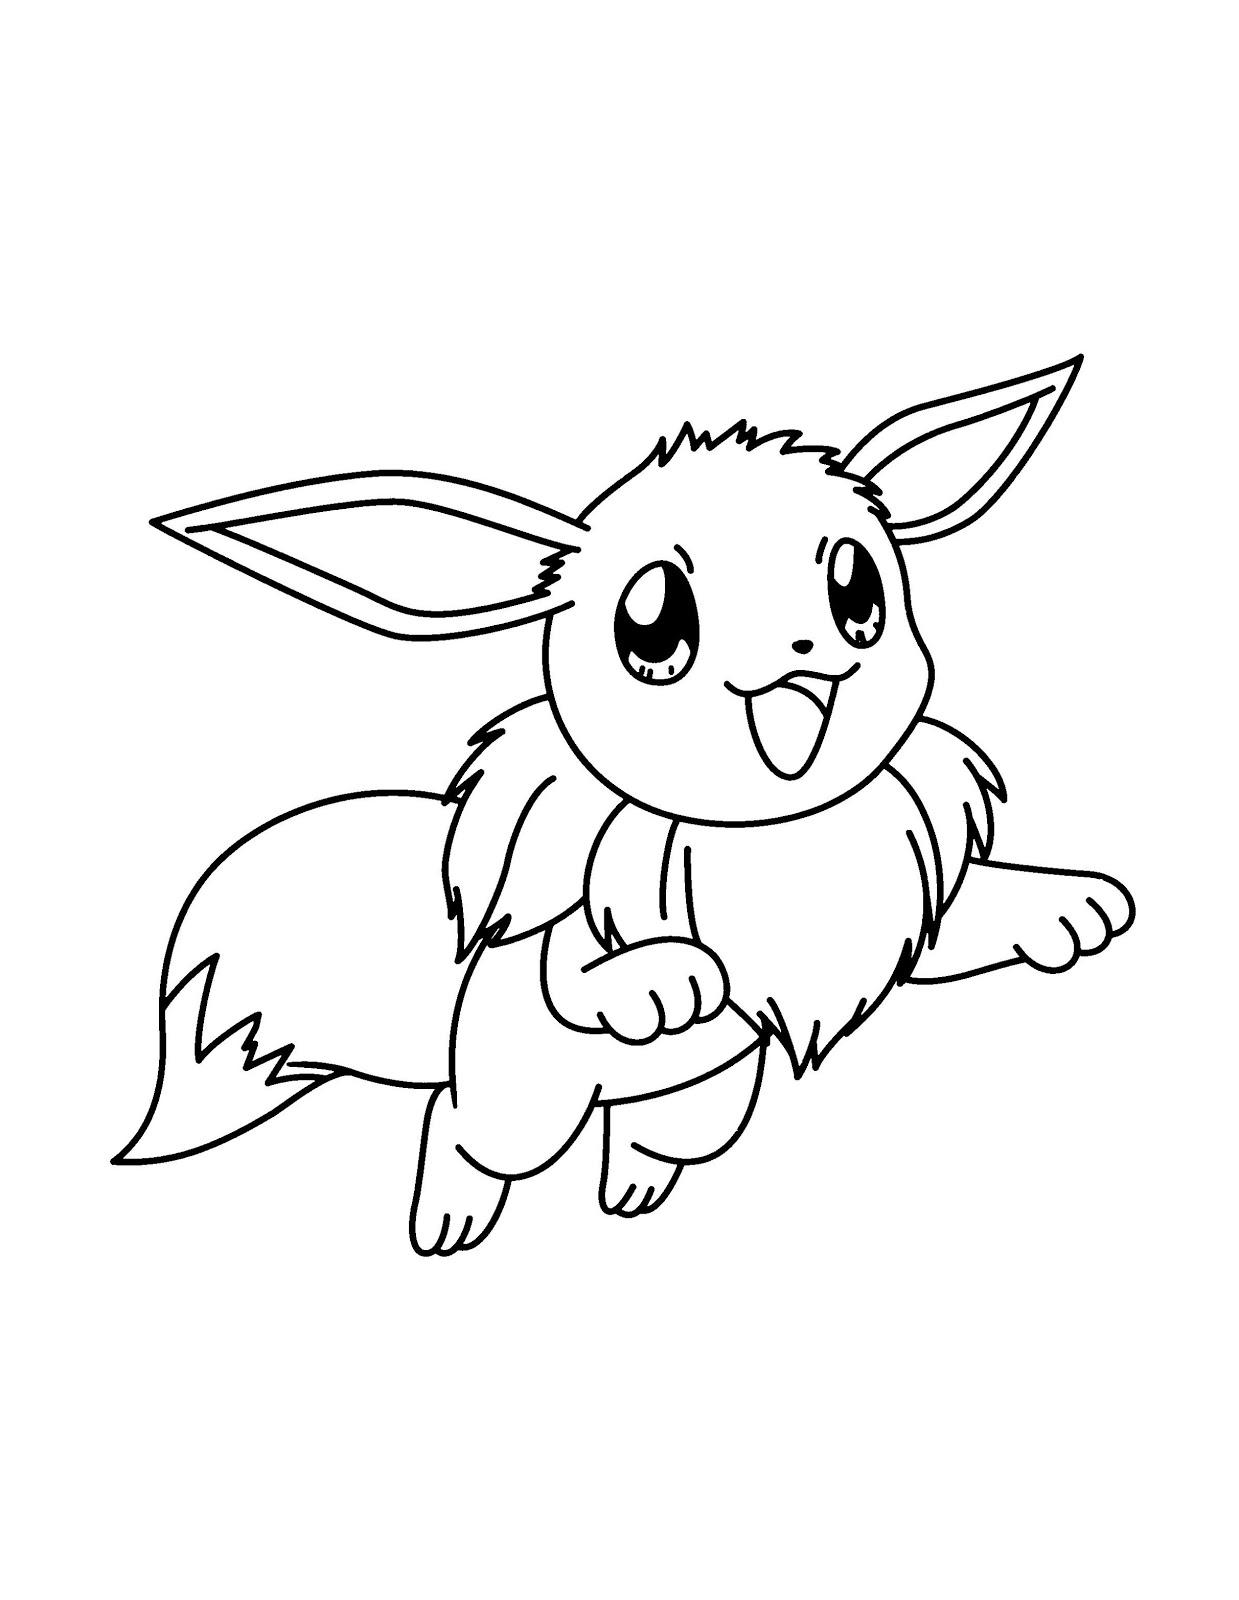 Free Printable Pokemon Coloring Page-vaporeon - Pokemon Adult ... | 1600x1239